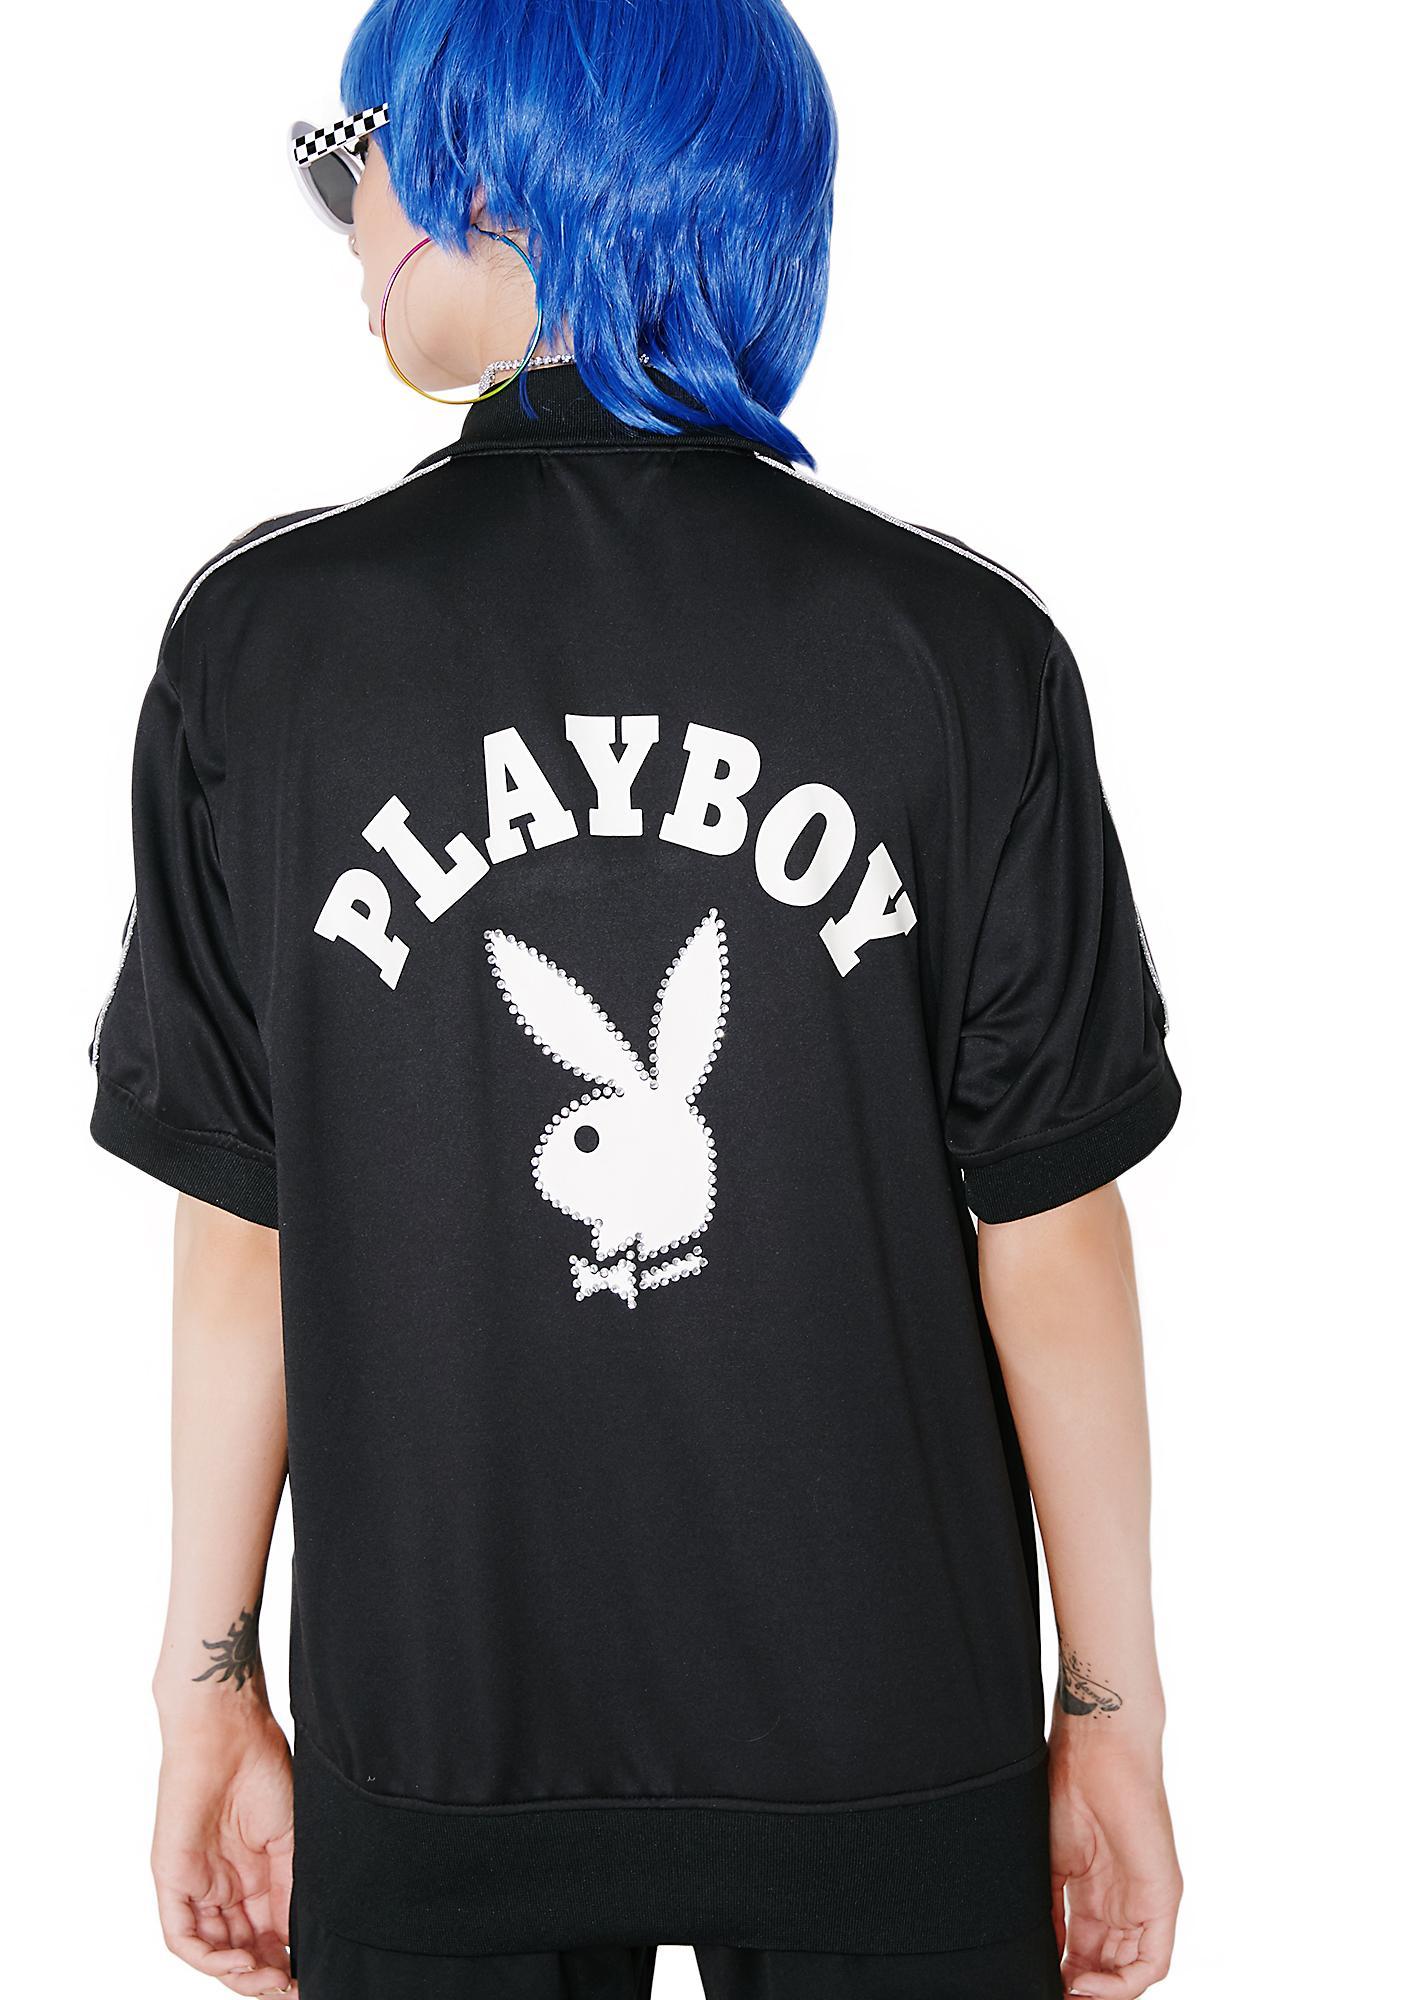 Vintage Playboy Track Jacket